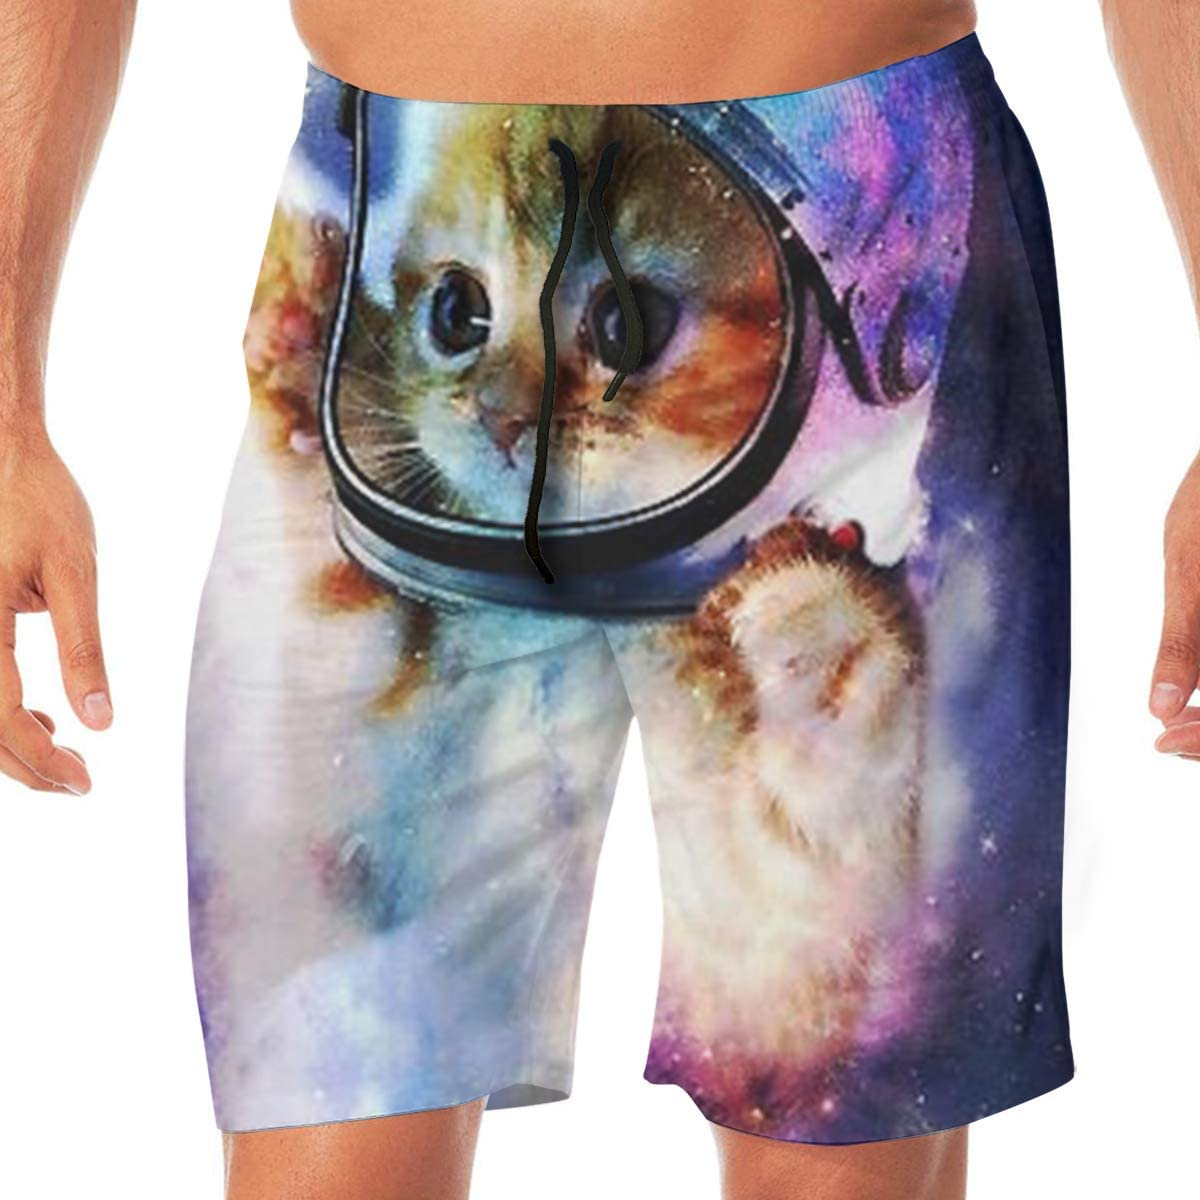 MaoYTUI Astronaut Cat in Space Mens Swim Trunks Boys Quick Dry Bathing Suits Drawstring Waist Beach Broad Shorts Swim Suit Beachwear with Mesh Lining